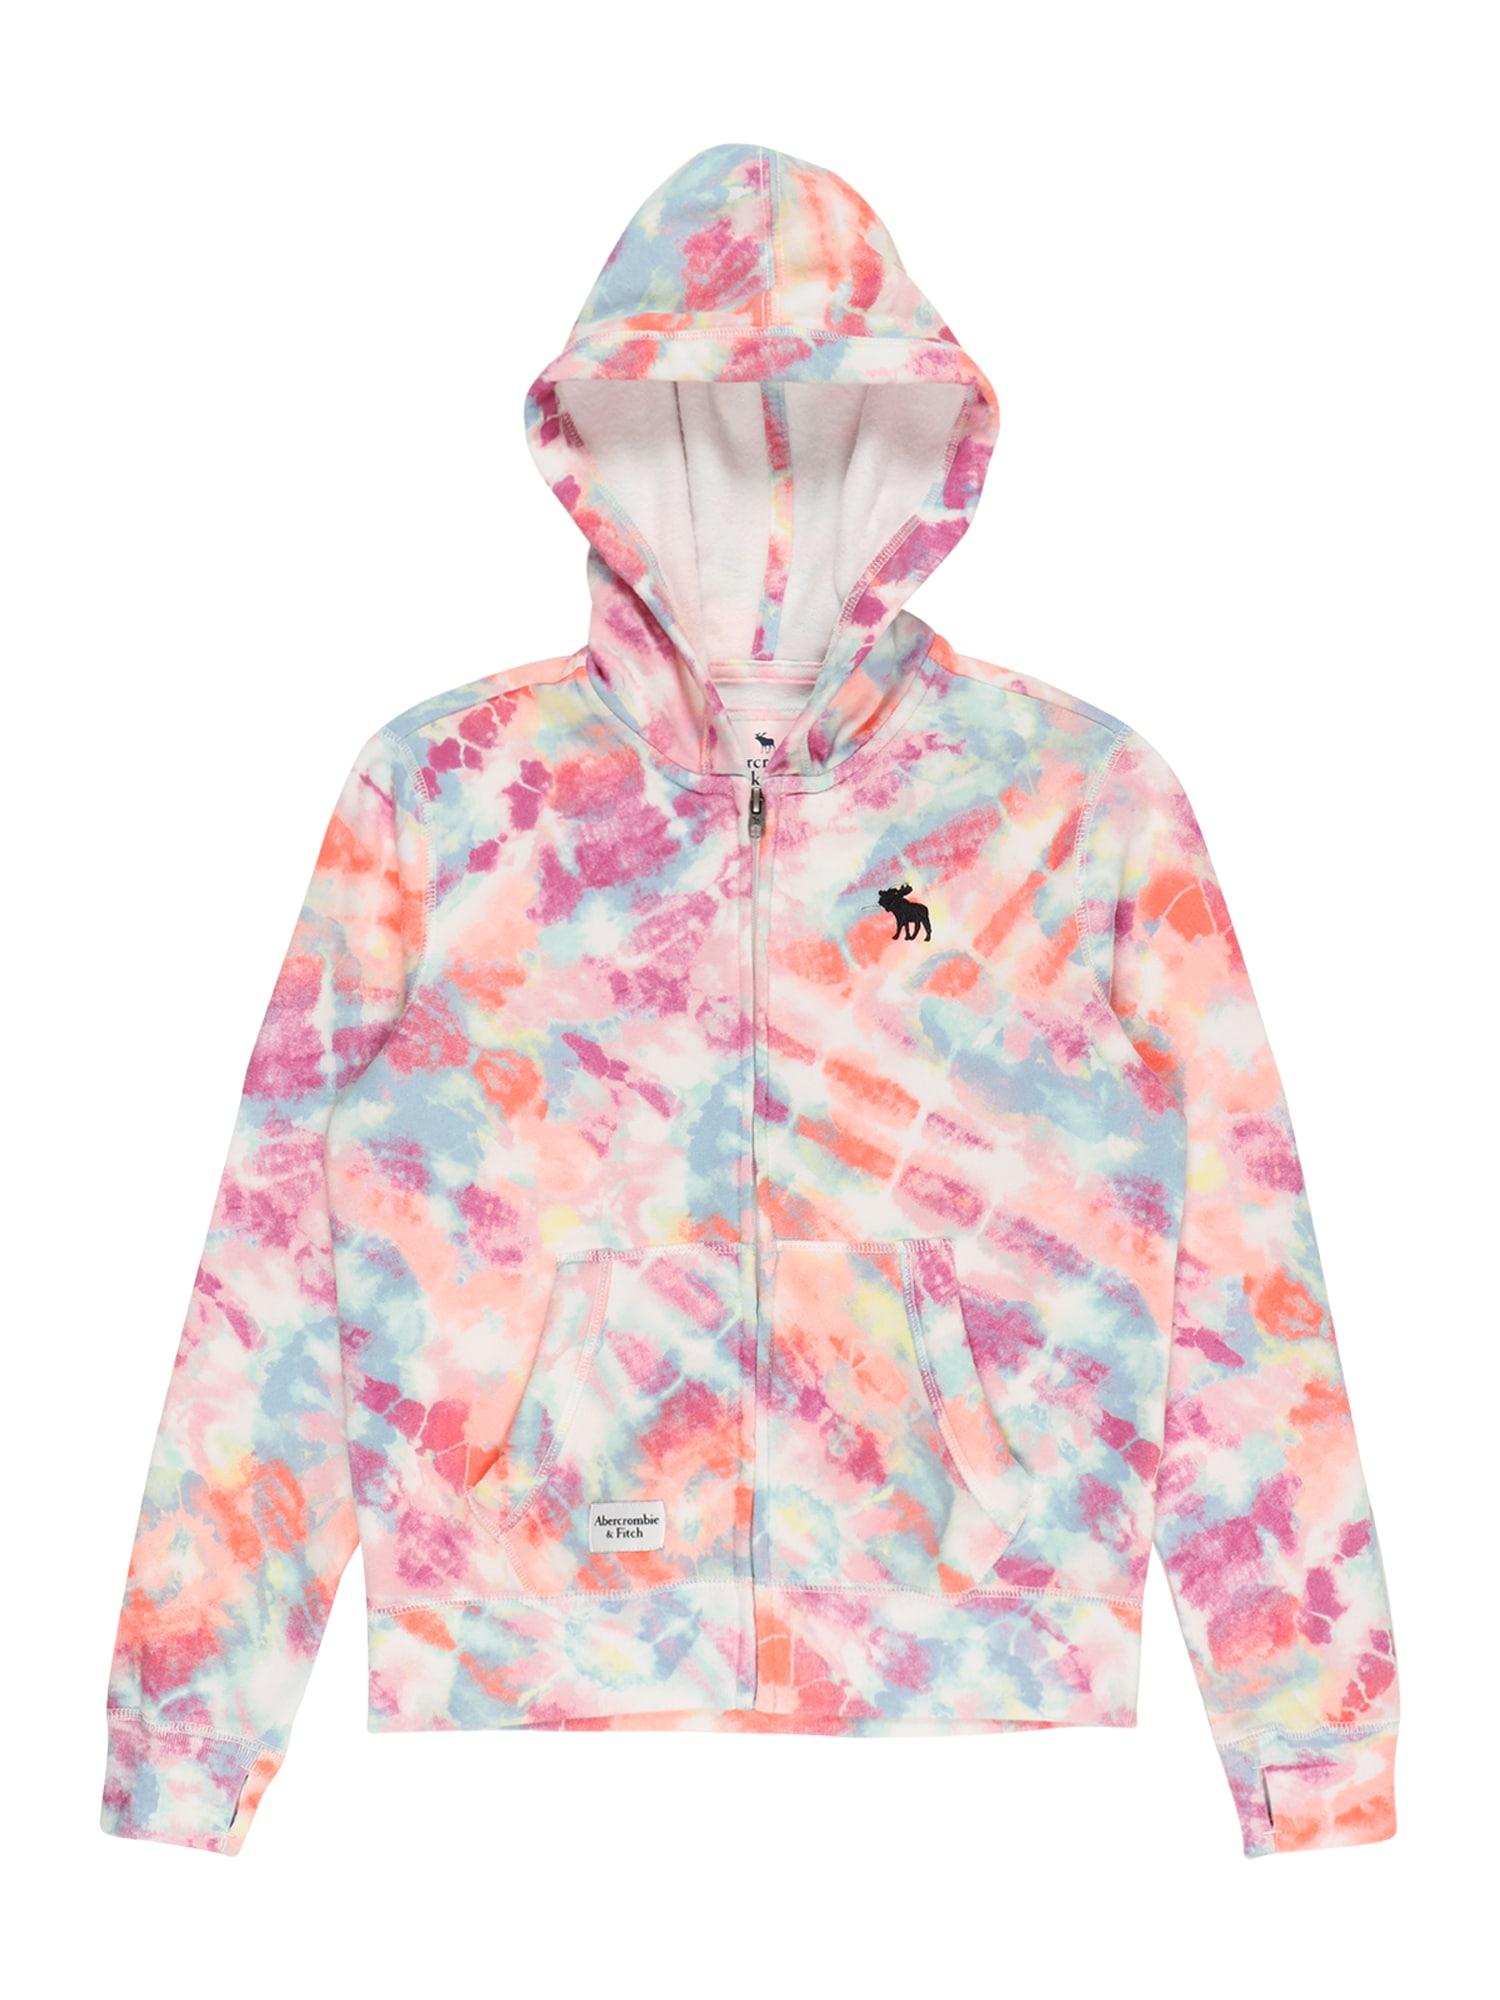 Abercrombie & Fitch Flisinis džemperis mišrios spalvos